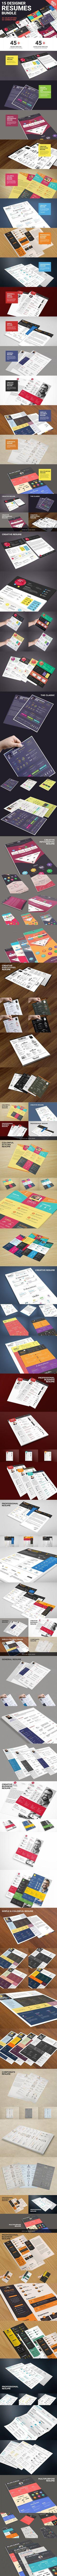 Massive Designer Resumes Bundle. Business Infographic. $29.00